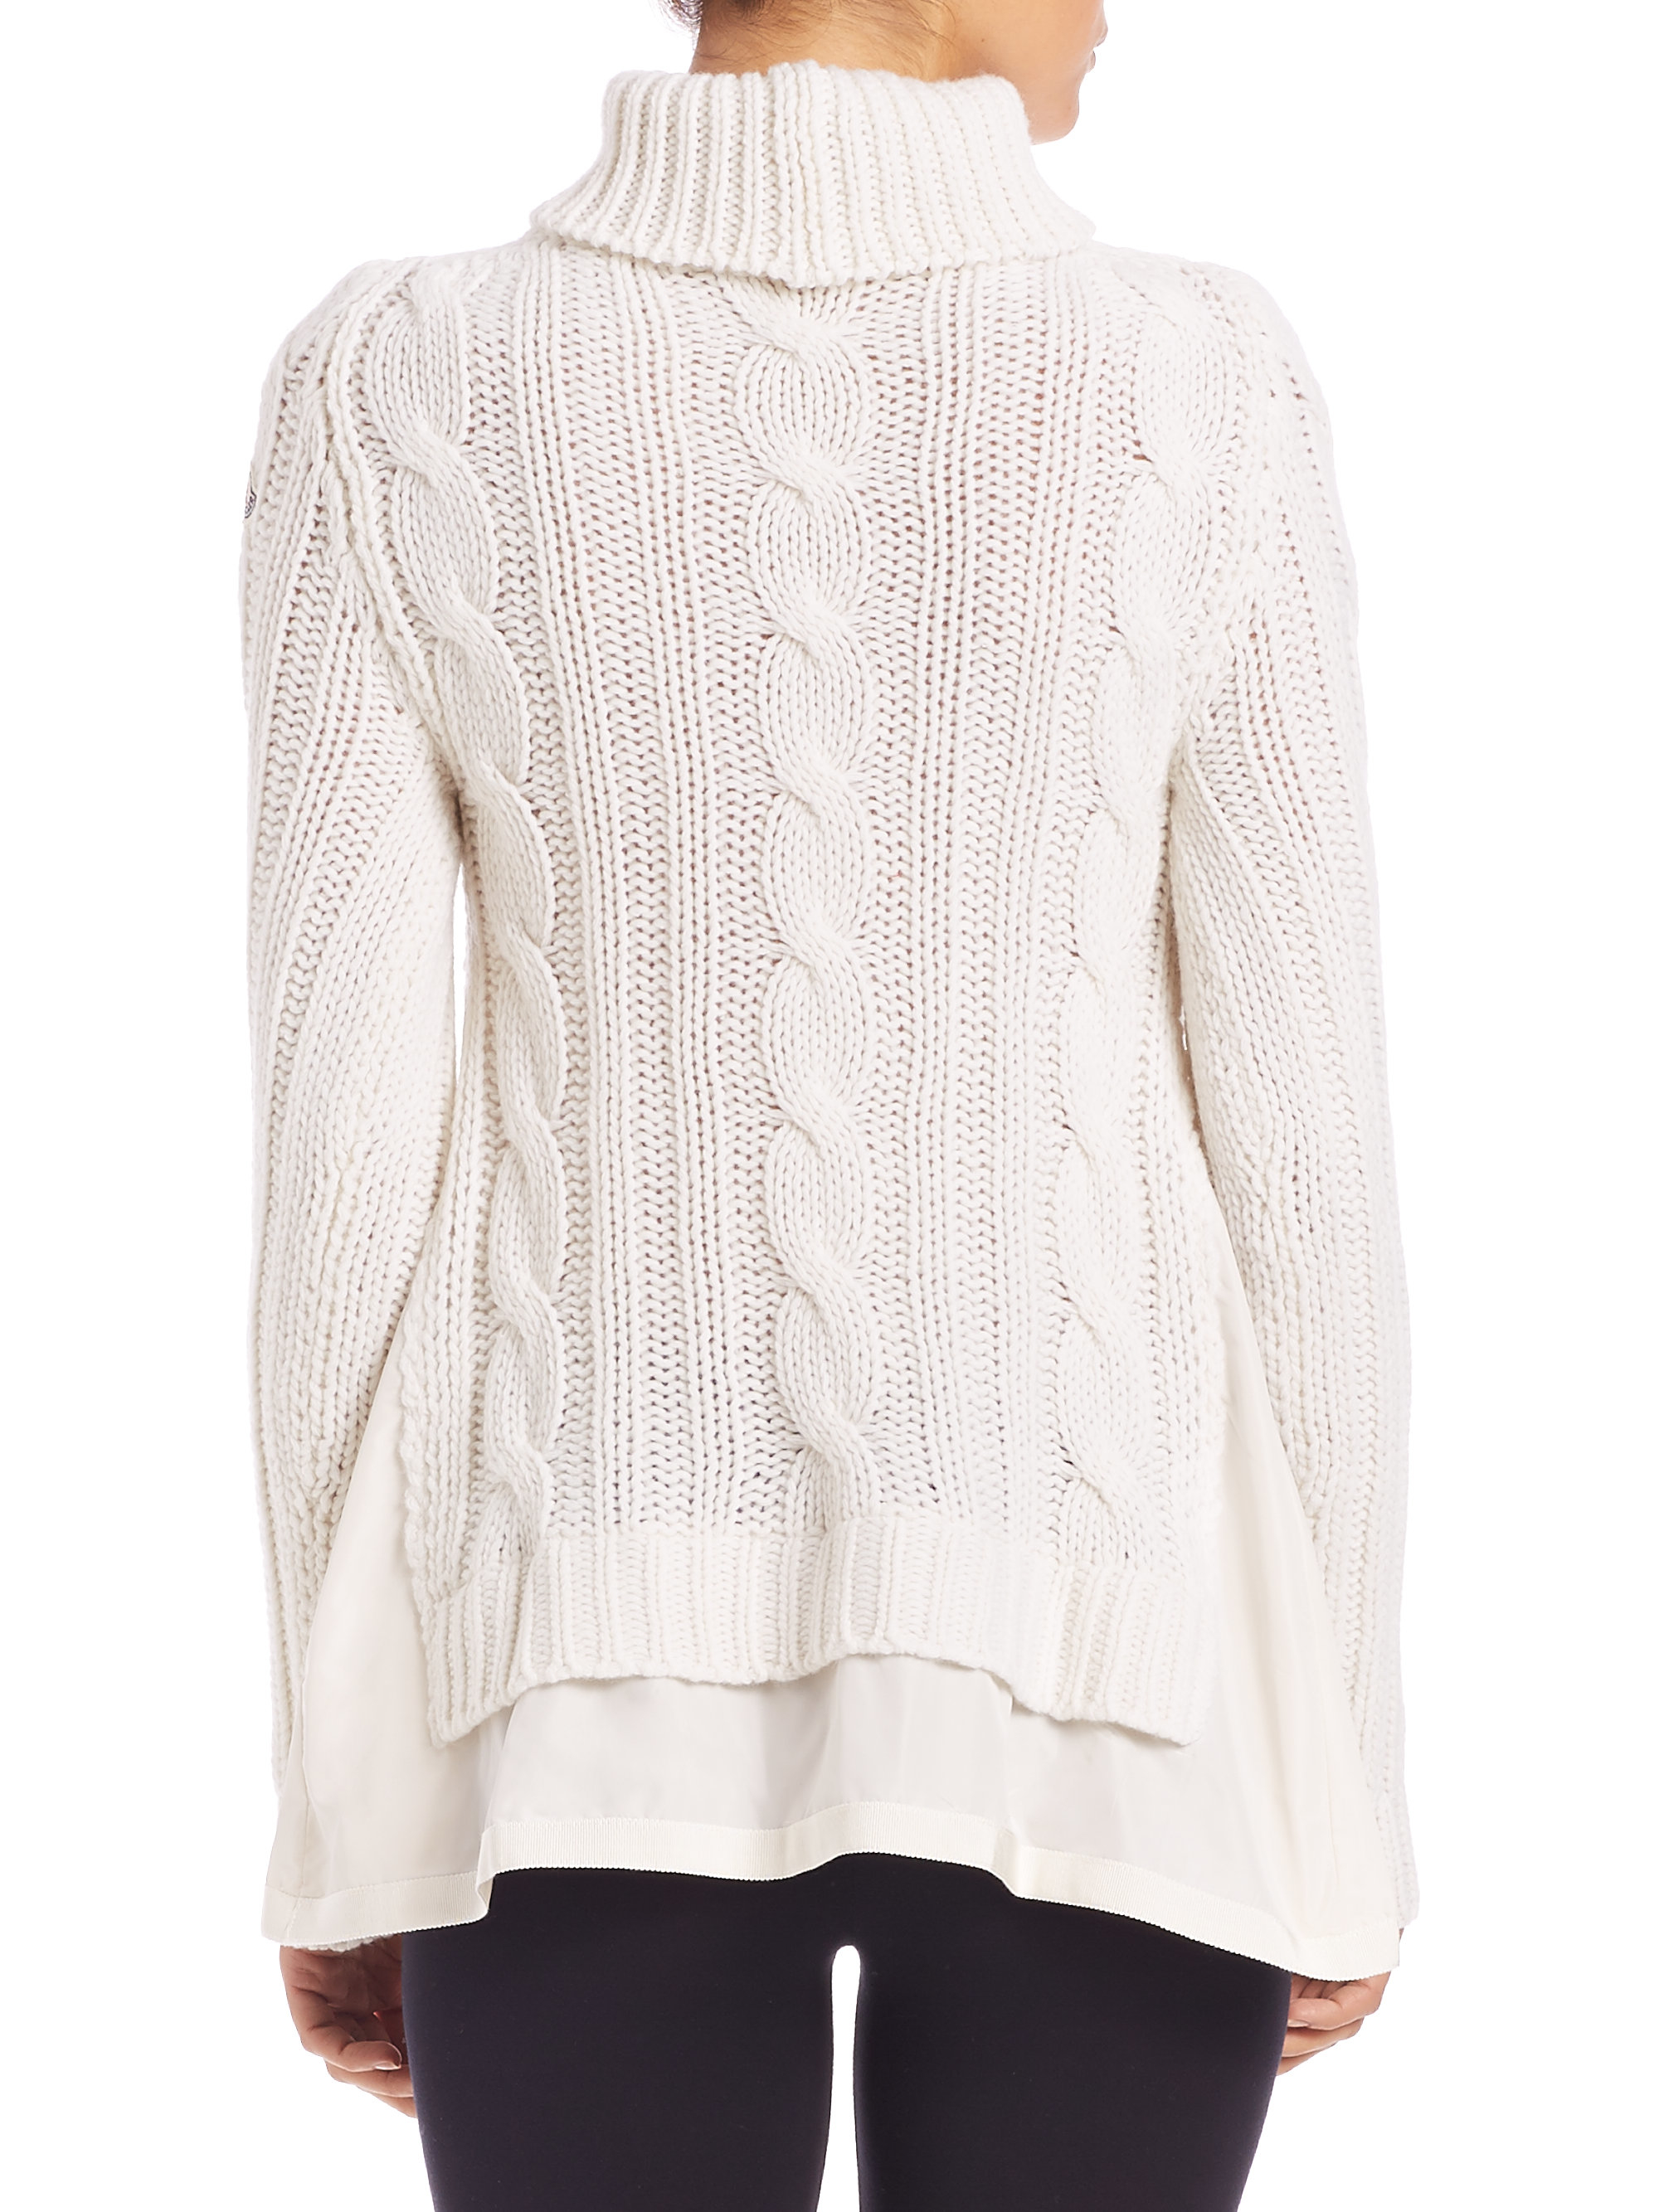 Hem Hemisphere Hem Sweater Gris Flared Flared Sweater Hemisphere Gris 41nxq66UE